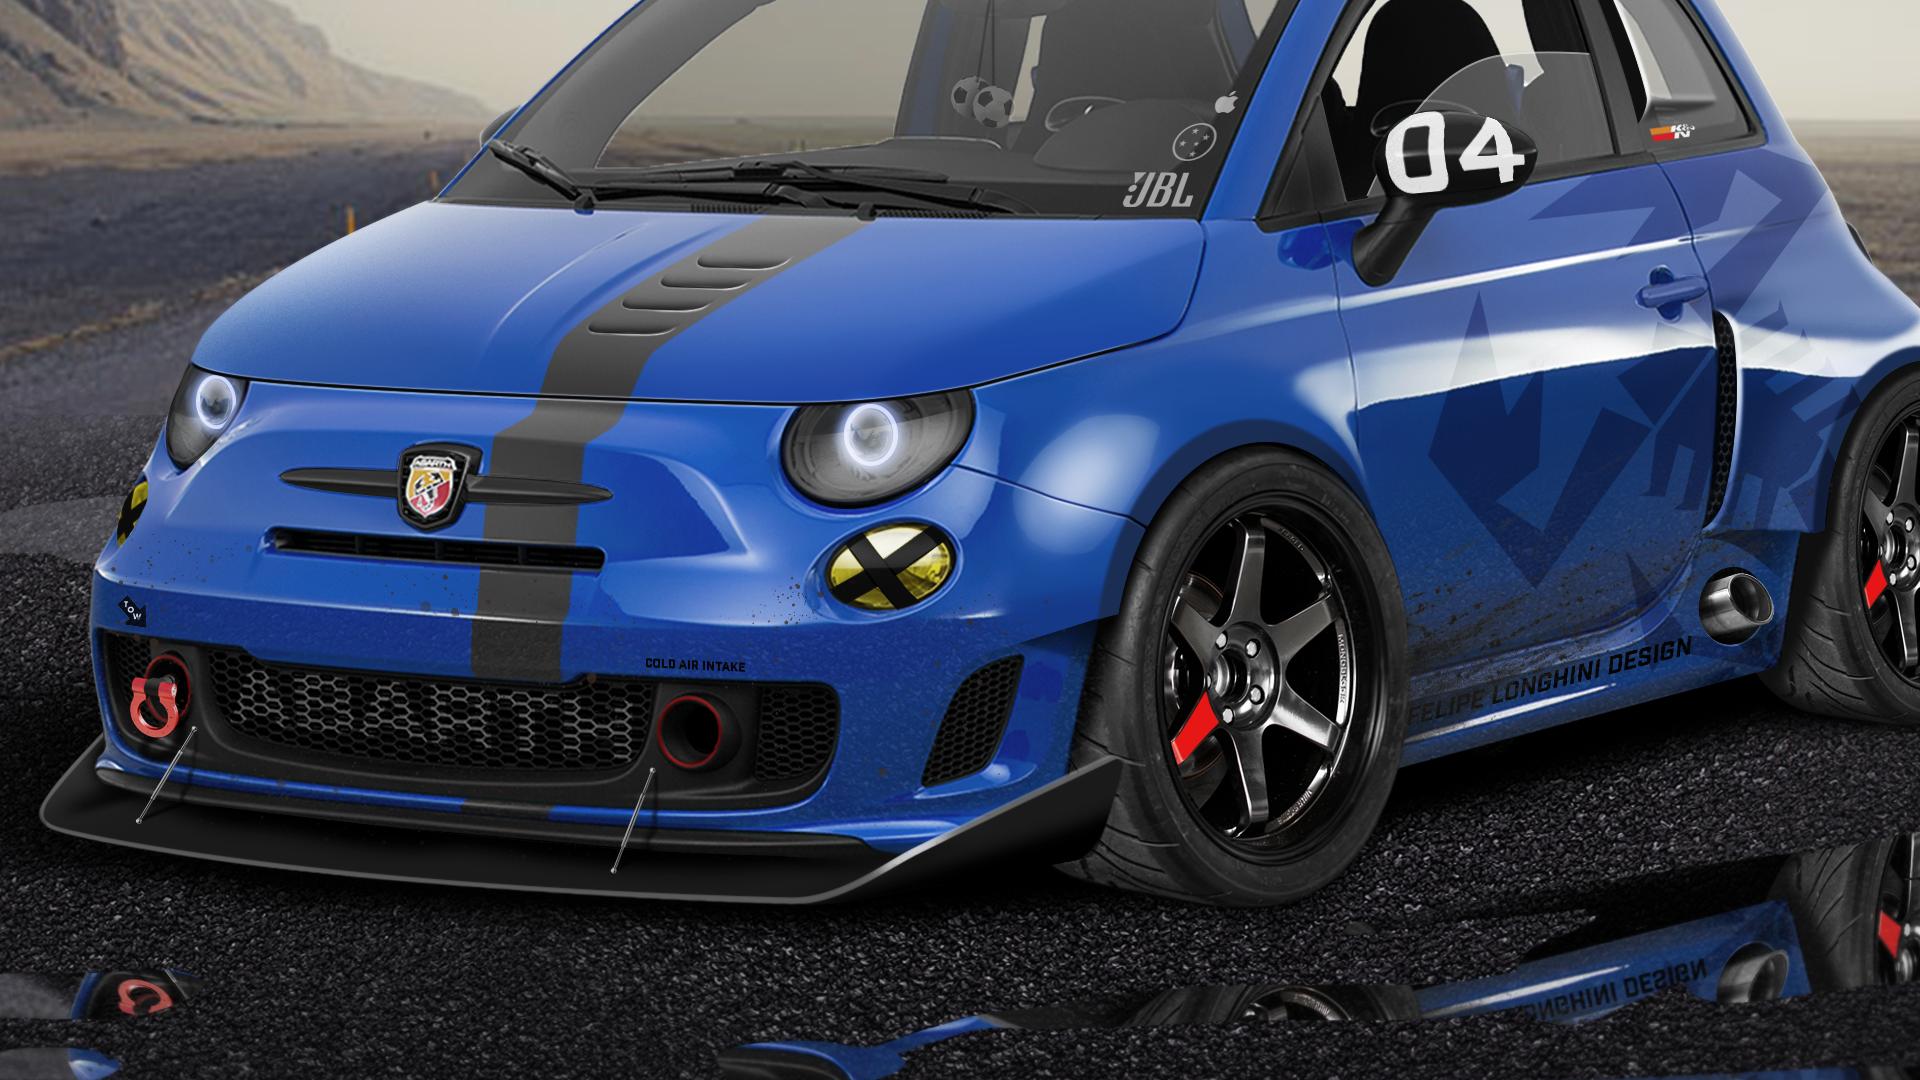 Make A Car >> felipe longhini - Blue Fiat 500 Abarth